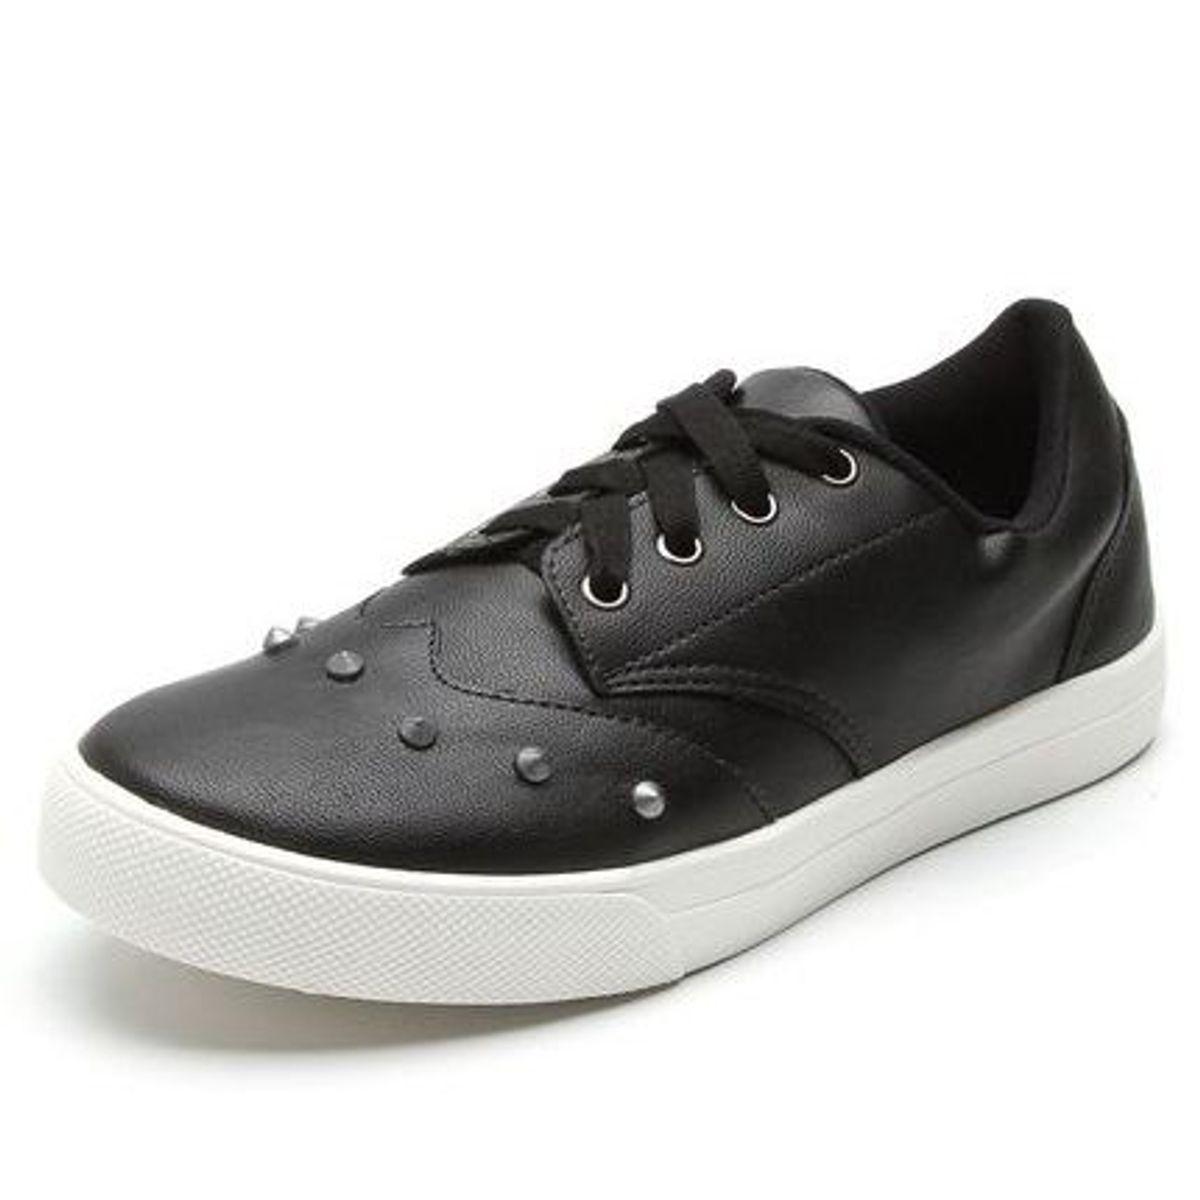 tênis couro spike preto - tênis ride skateboard